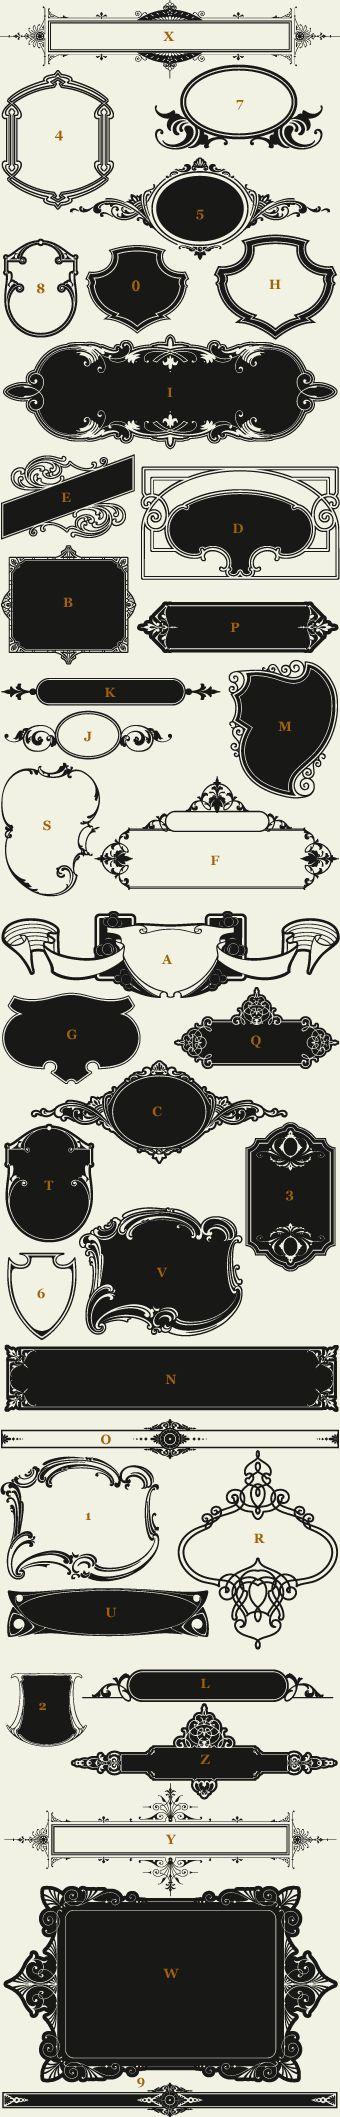 Letterhead Fonts / LHF Americana Panels / Decorative Panels